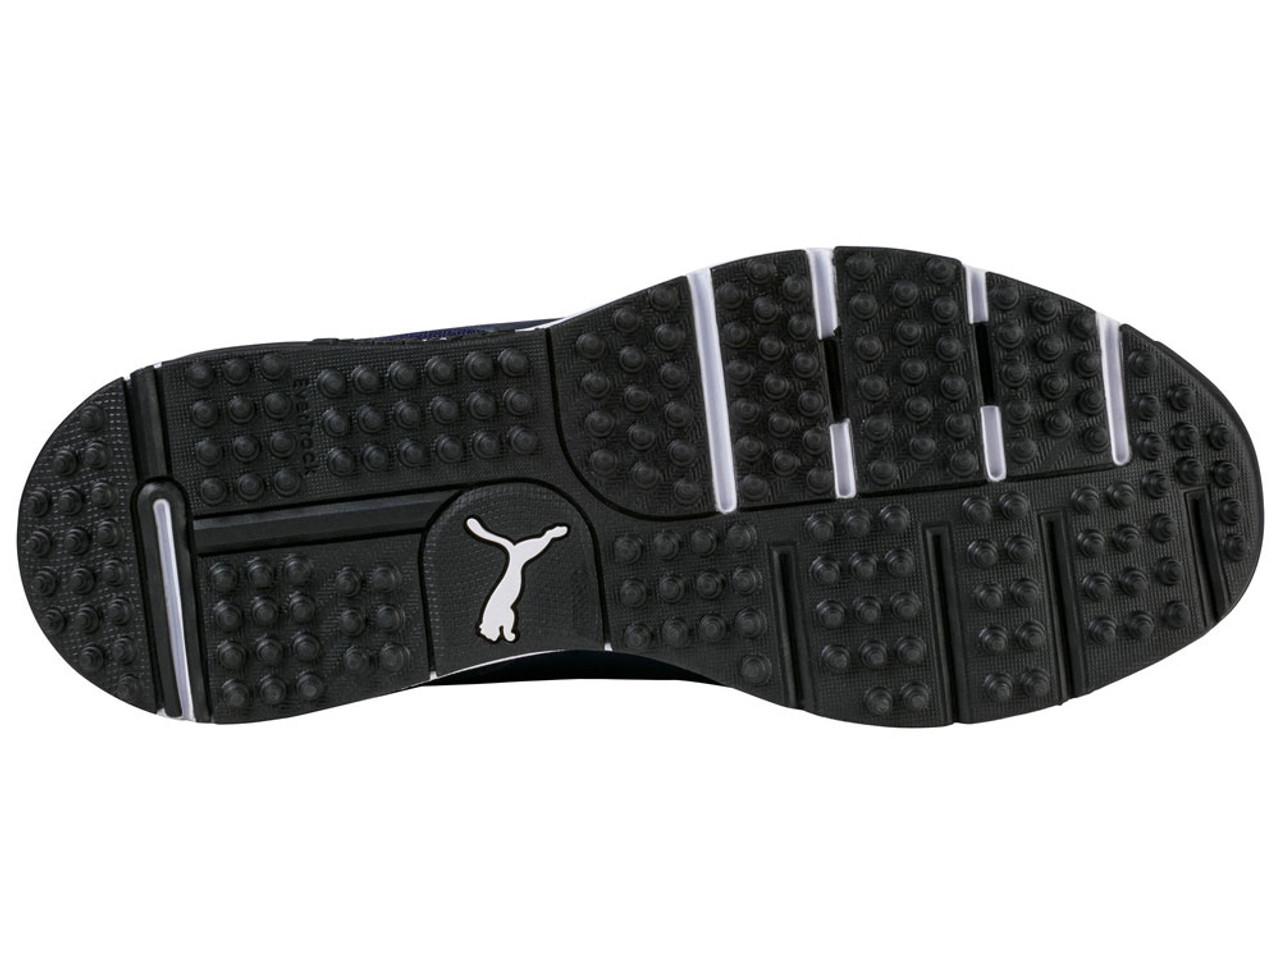 d67e2a54b46fe5 Puma Grip Sport Tech Golf Shoes - Peacoat Marina - Mens For Sale ...